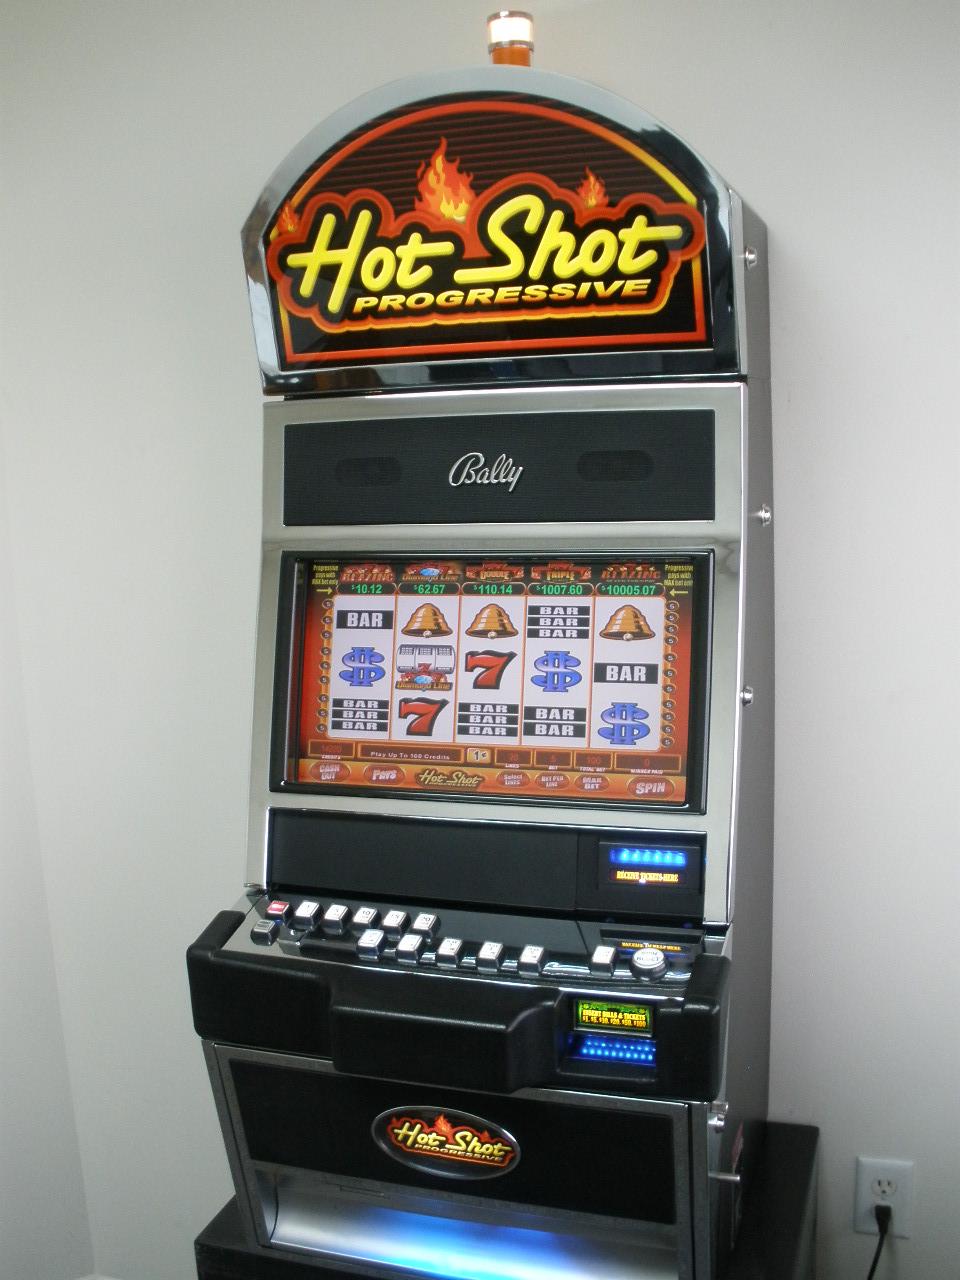 Treasure mile casino $100 no deposit bonus 2020